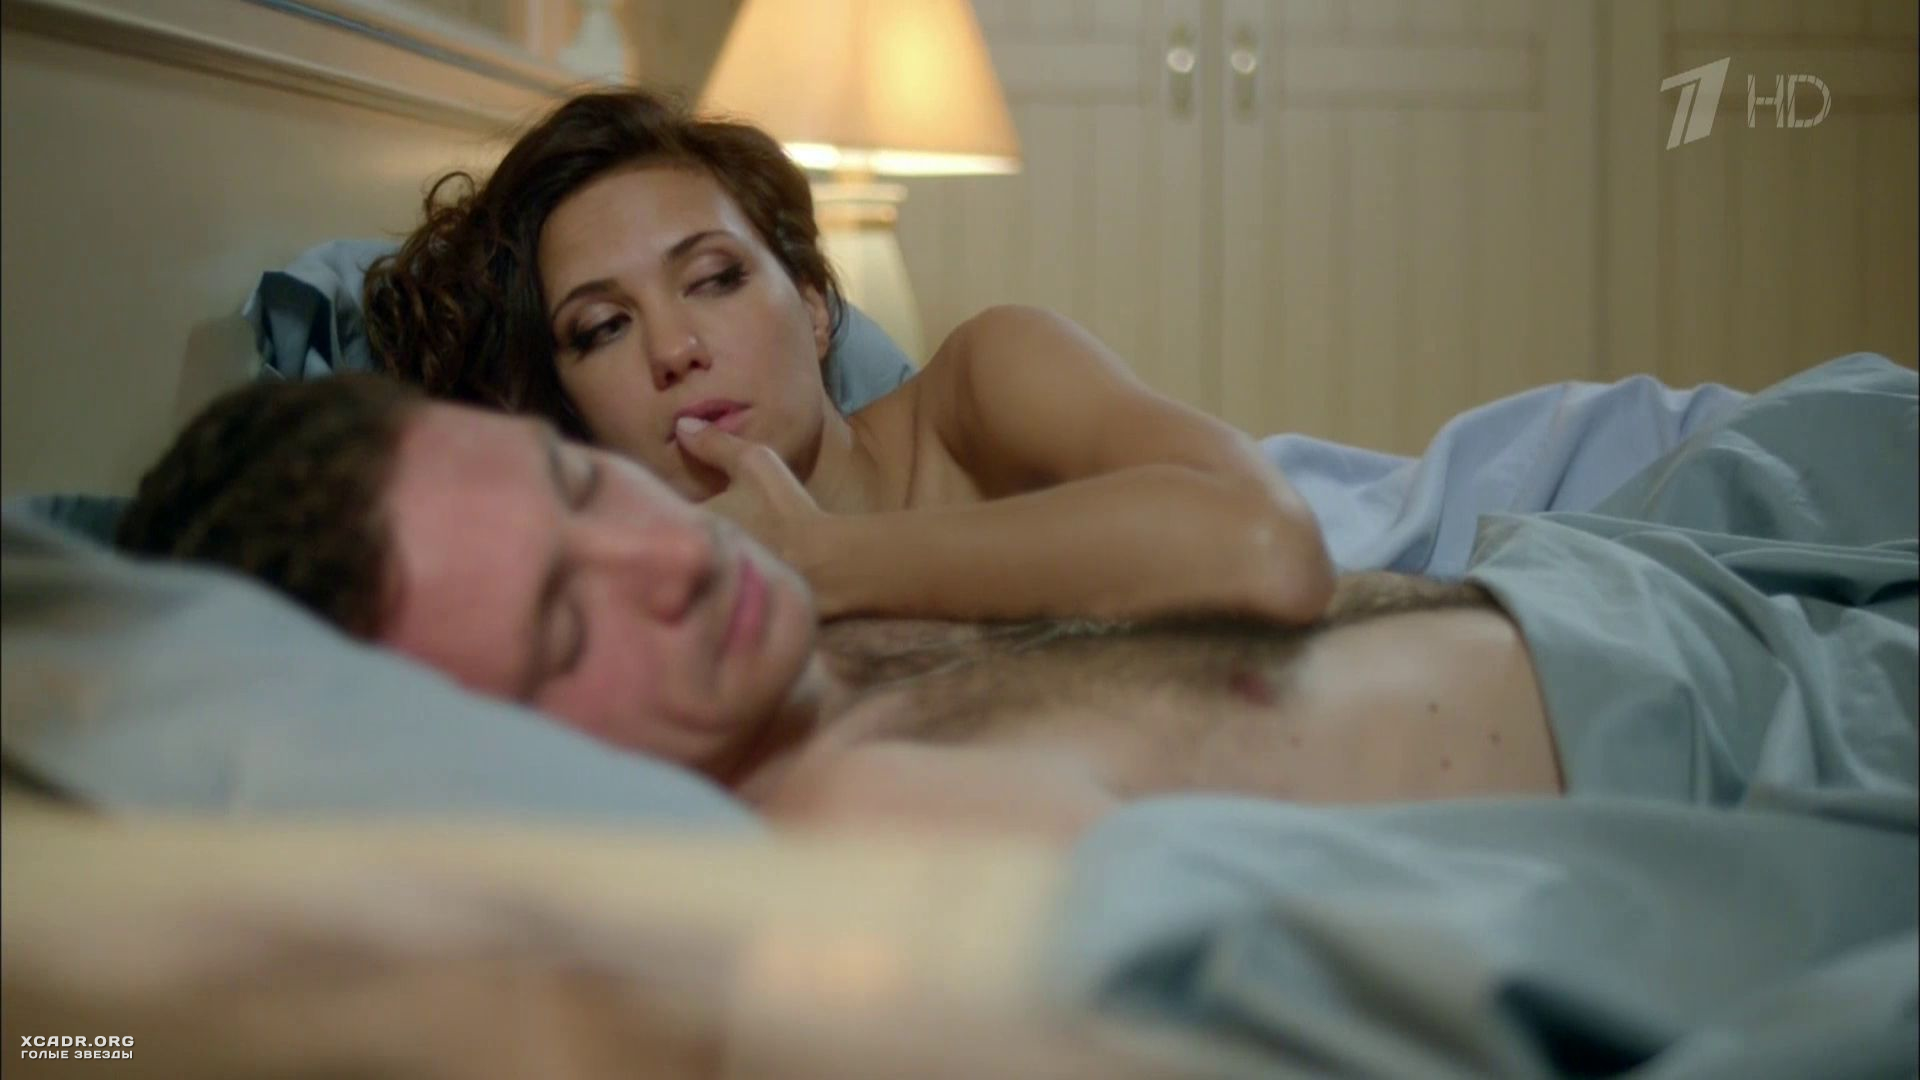 klimova-ekaterina-seks-foto